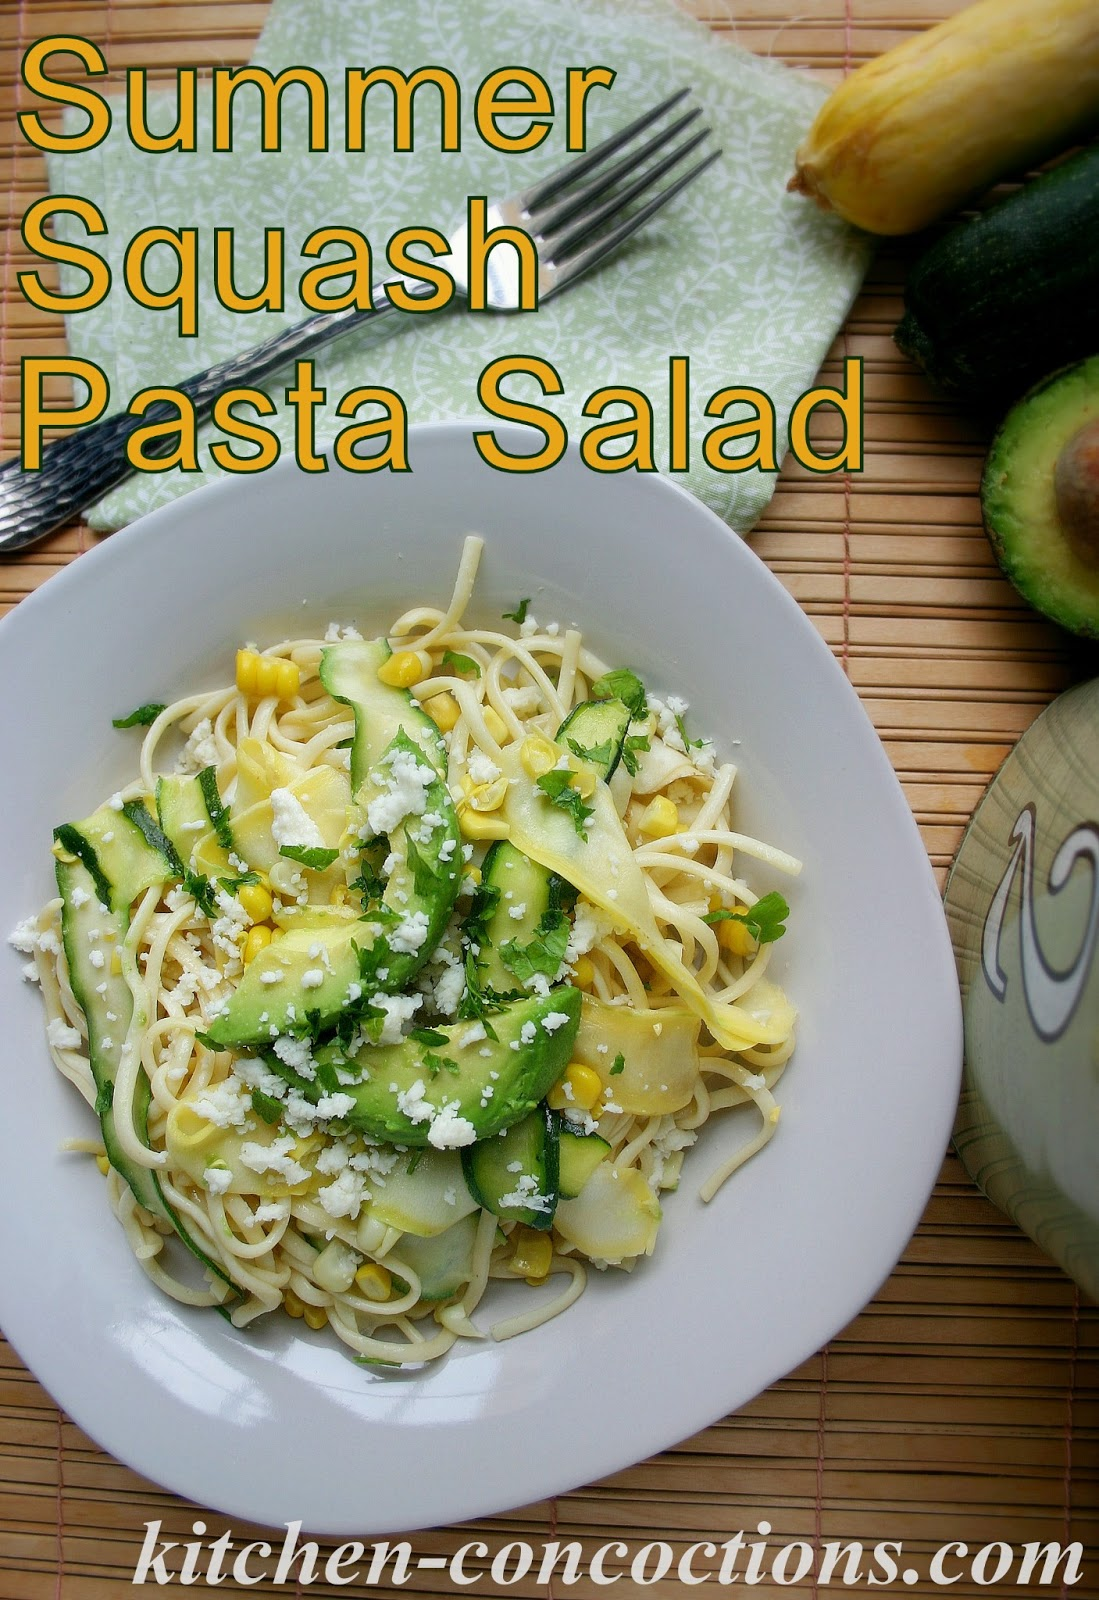 Zucchini Ribbon Salad With Sweet Corn & Avocado Recipes — Dishmaps